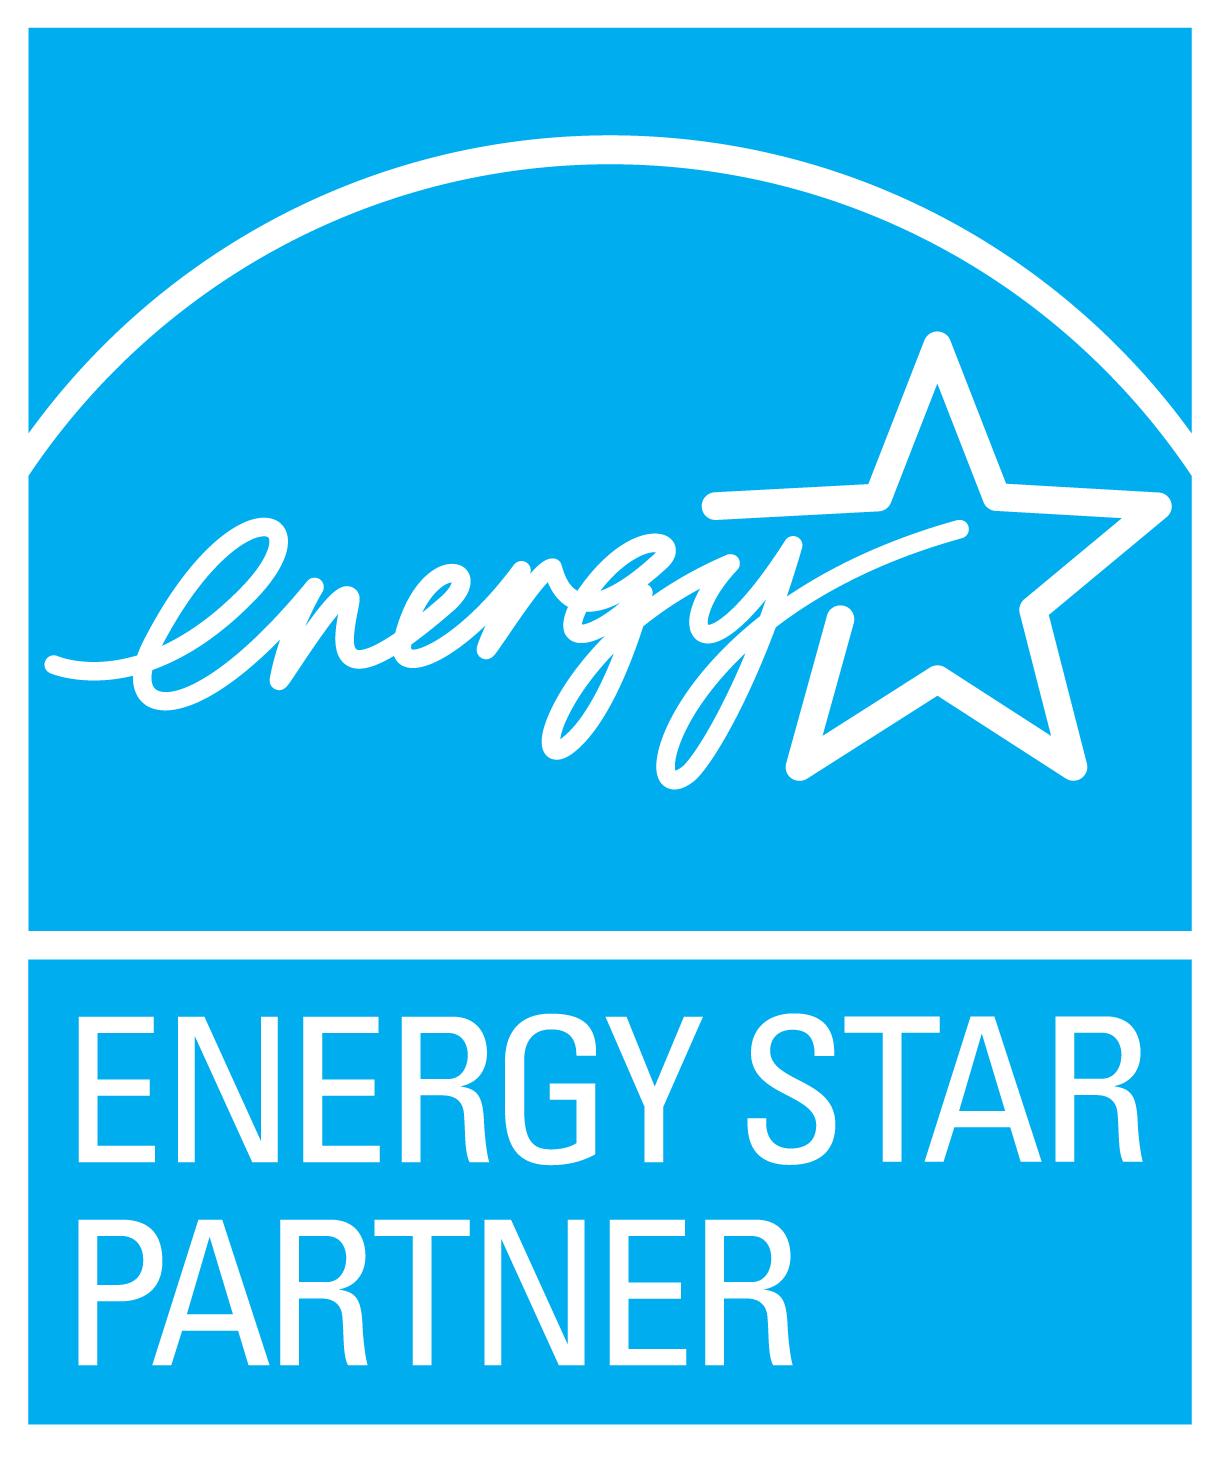 https://www.energystar.gov/ia/partners/logos/images/partner_v_c.png?CFID=23481205&CFTOKEN=74fb21c49445341d-D1F54E8B-EC31-4A4A-125733CF20F0E9BD